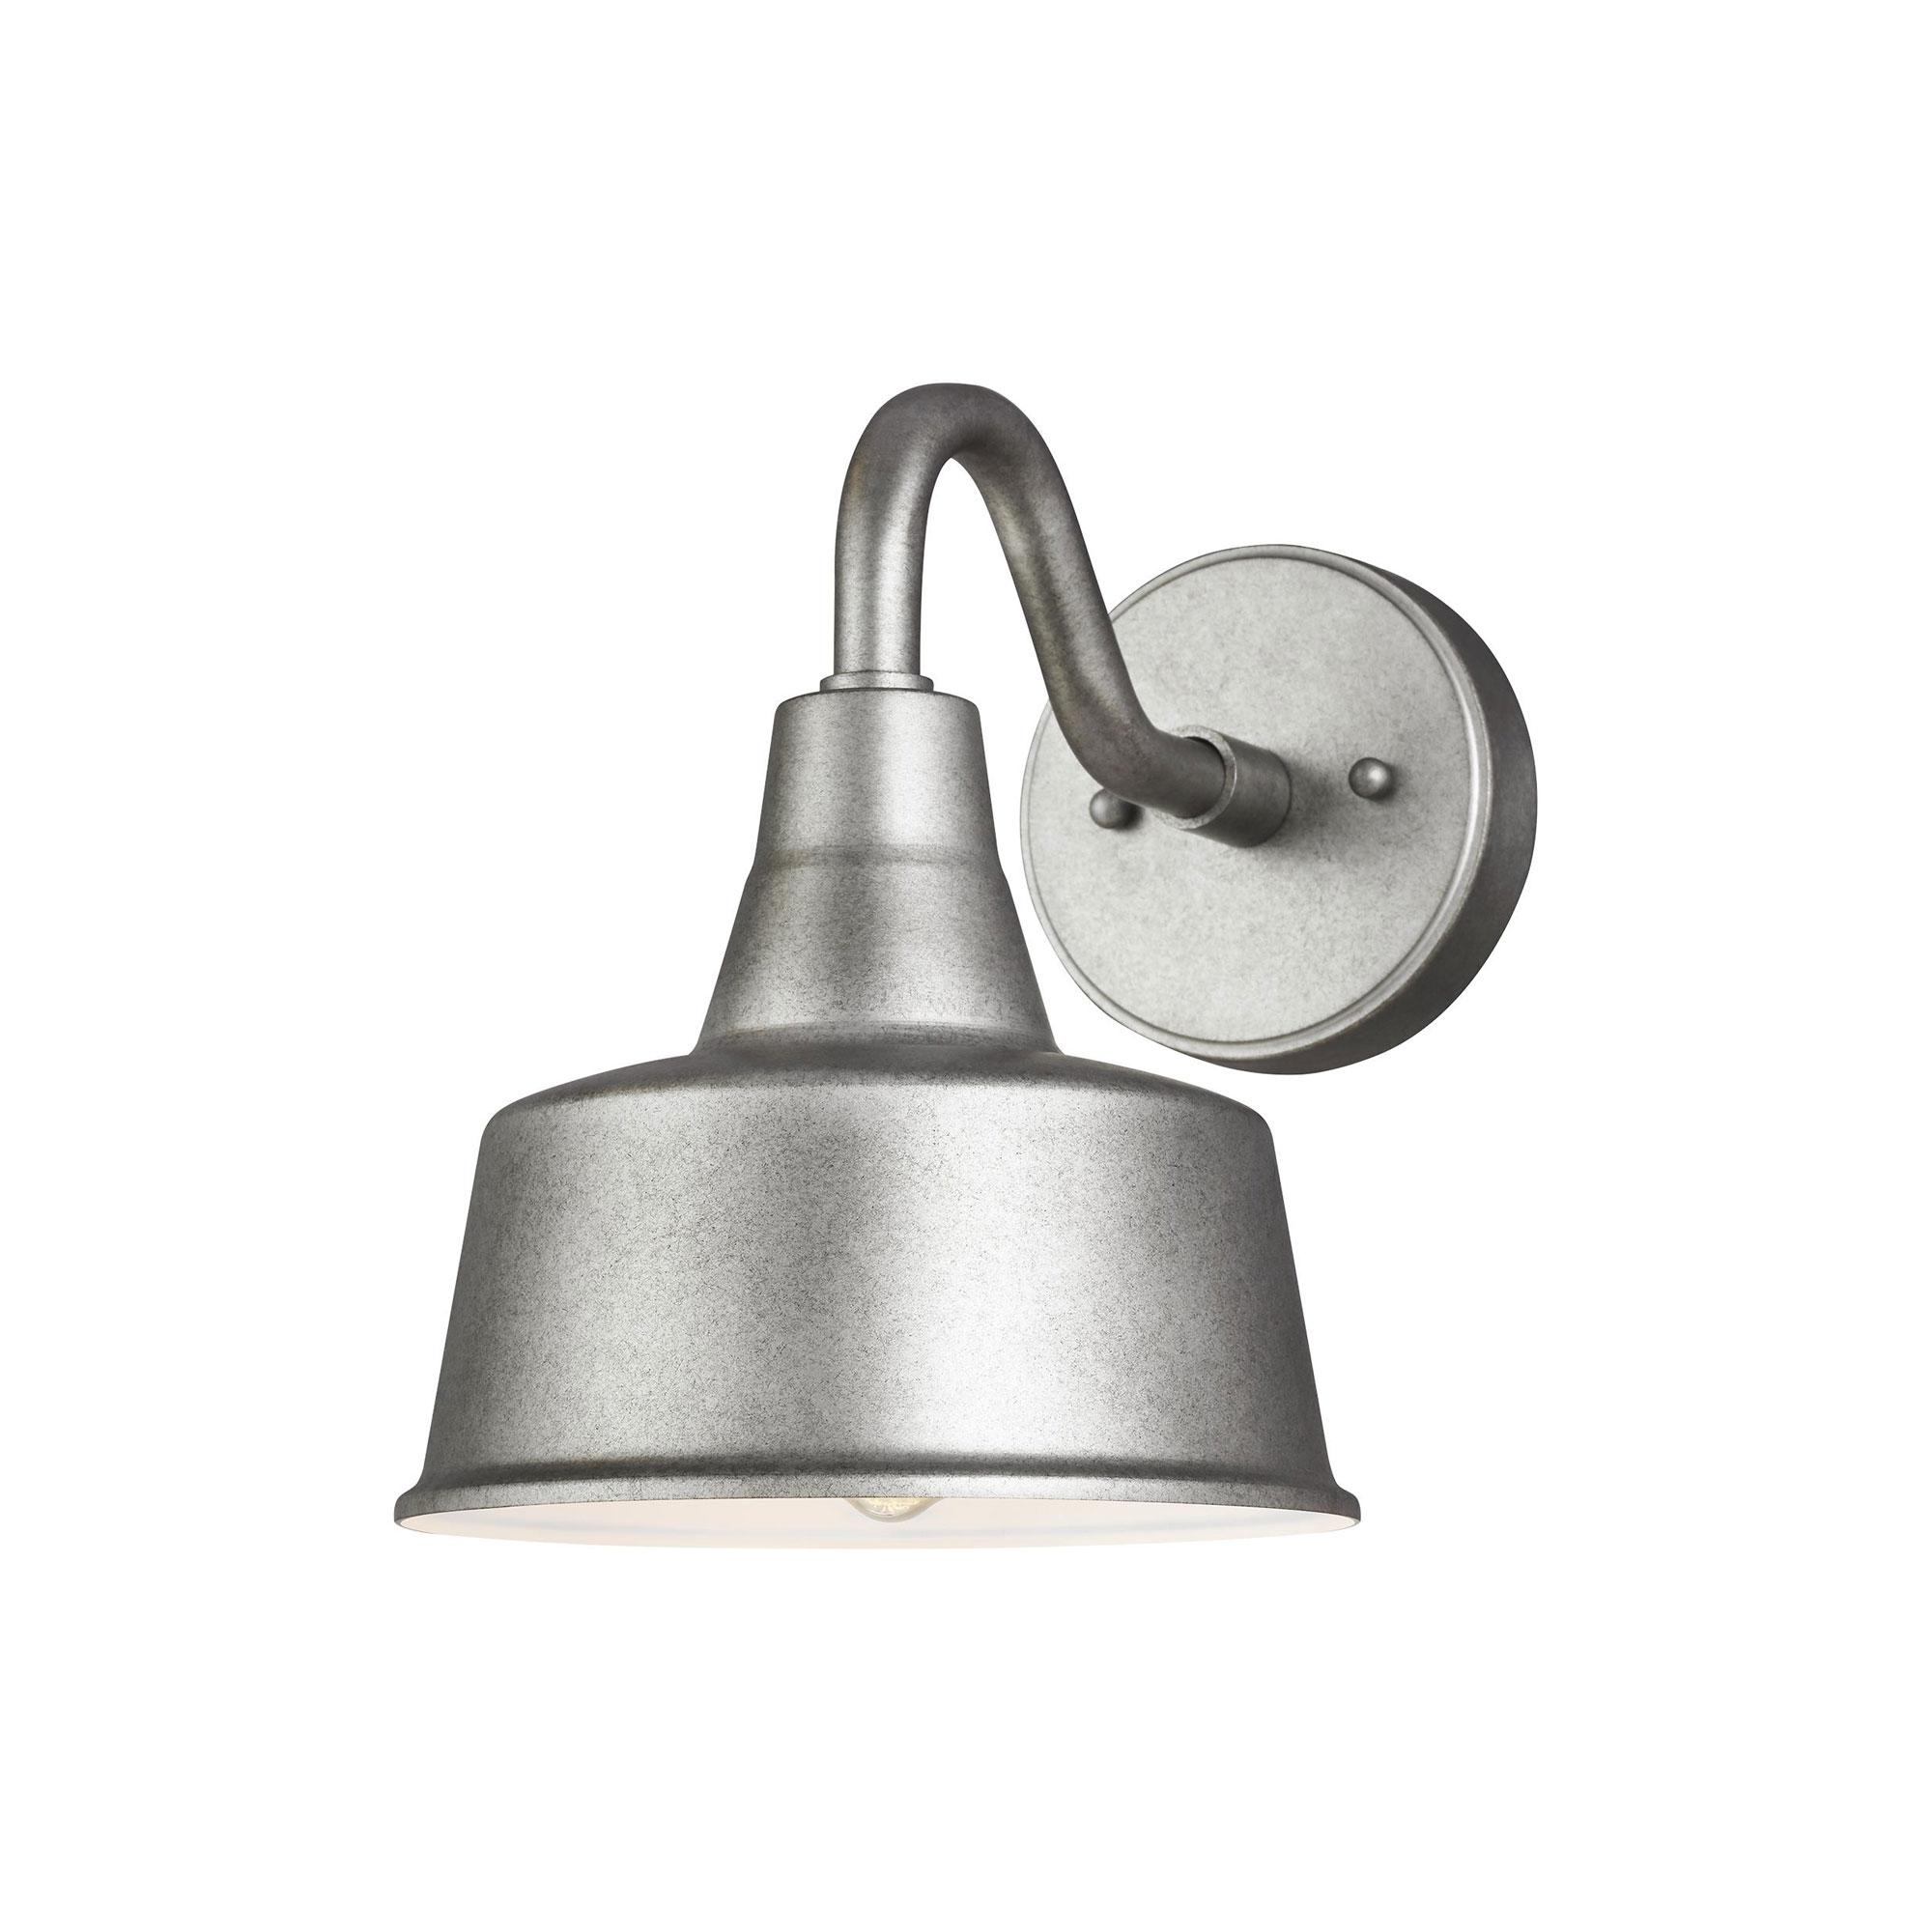 15H x 16W 1-Light 9.3 Watt Antique Bronze Sea Gull 8837401EN3-71 Barn Light Dark Sky Compliant Metal Shade LED Outdoor Wall Sconce Lighting Fixture